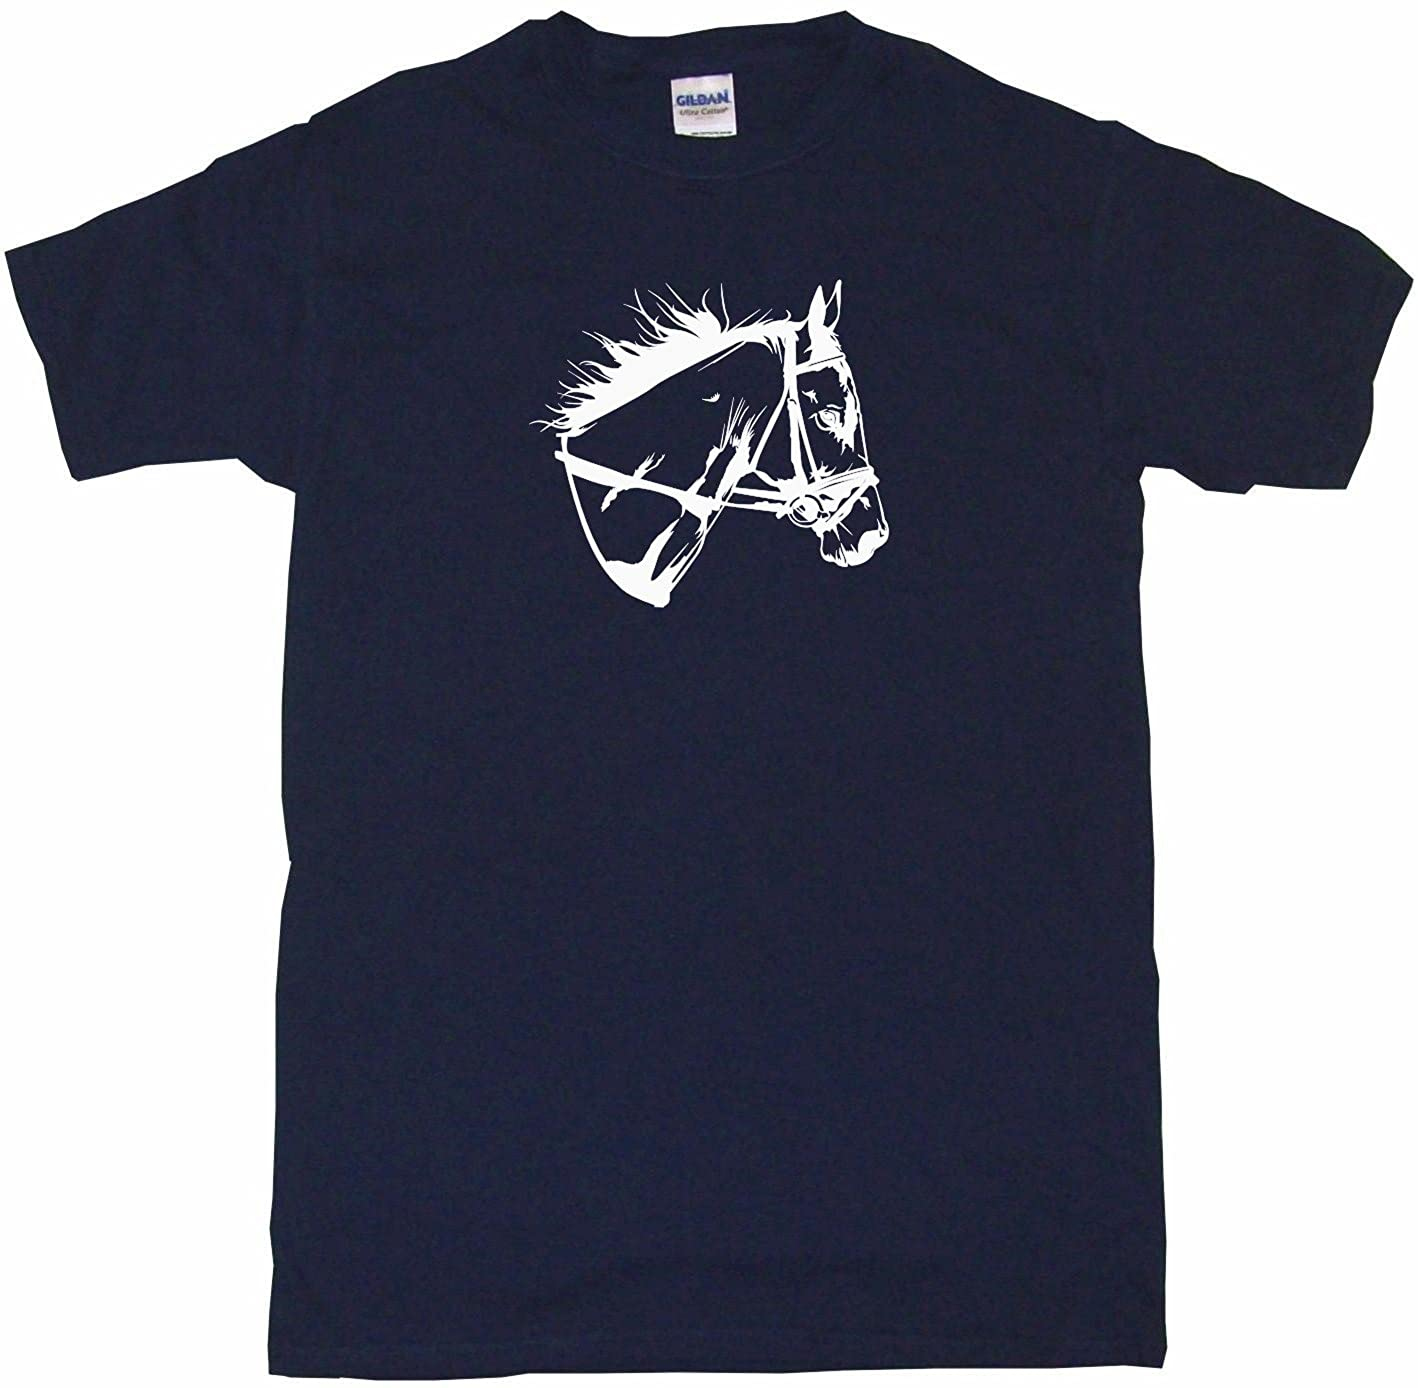 99 Volts Horse Head with Bridle Logo Big Boy's Kids Tee Shirt